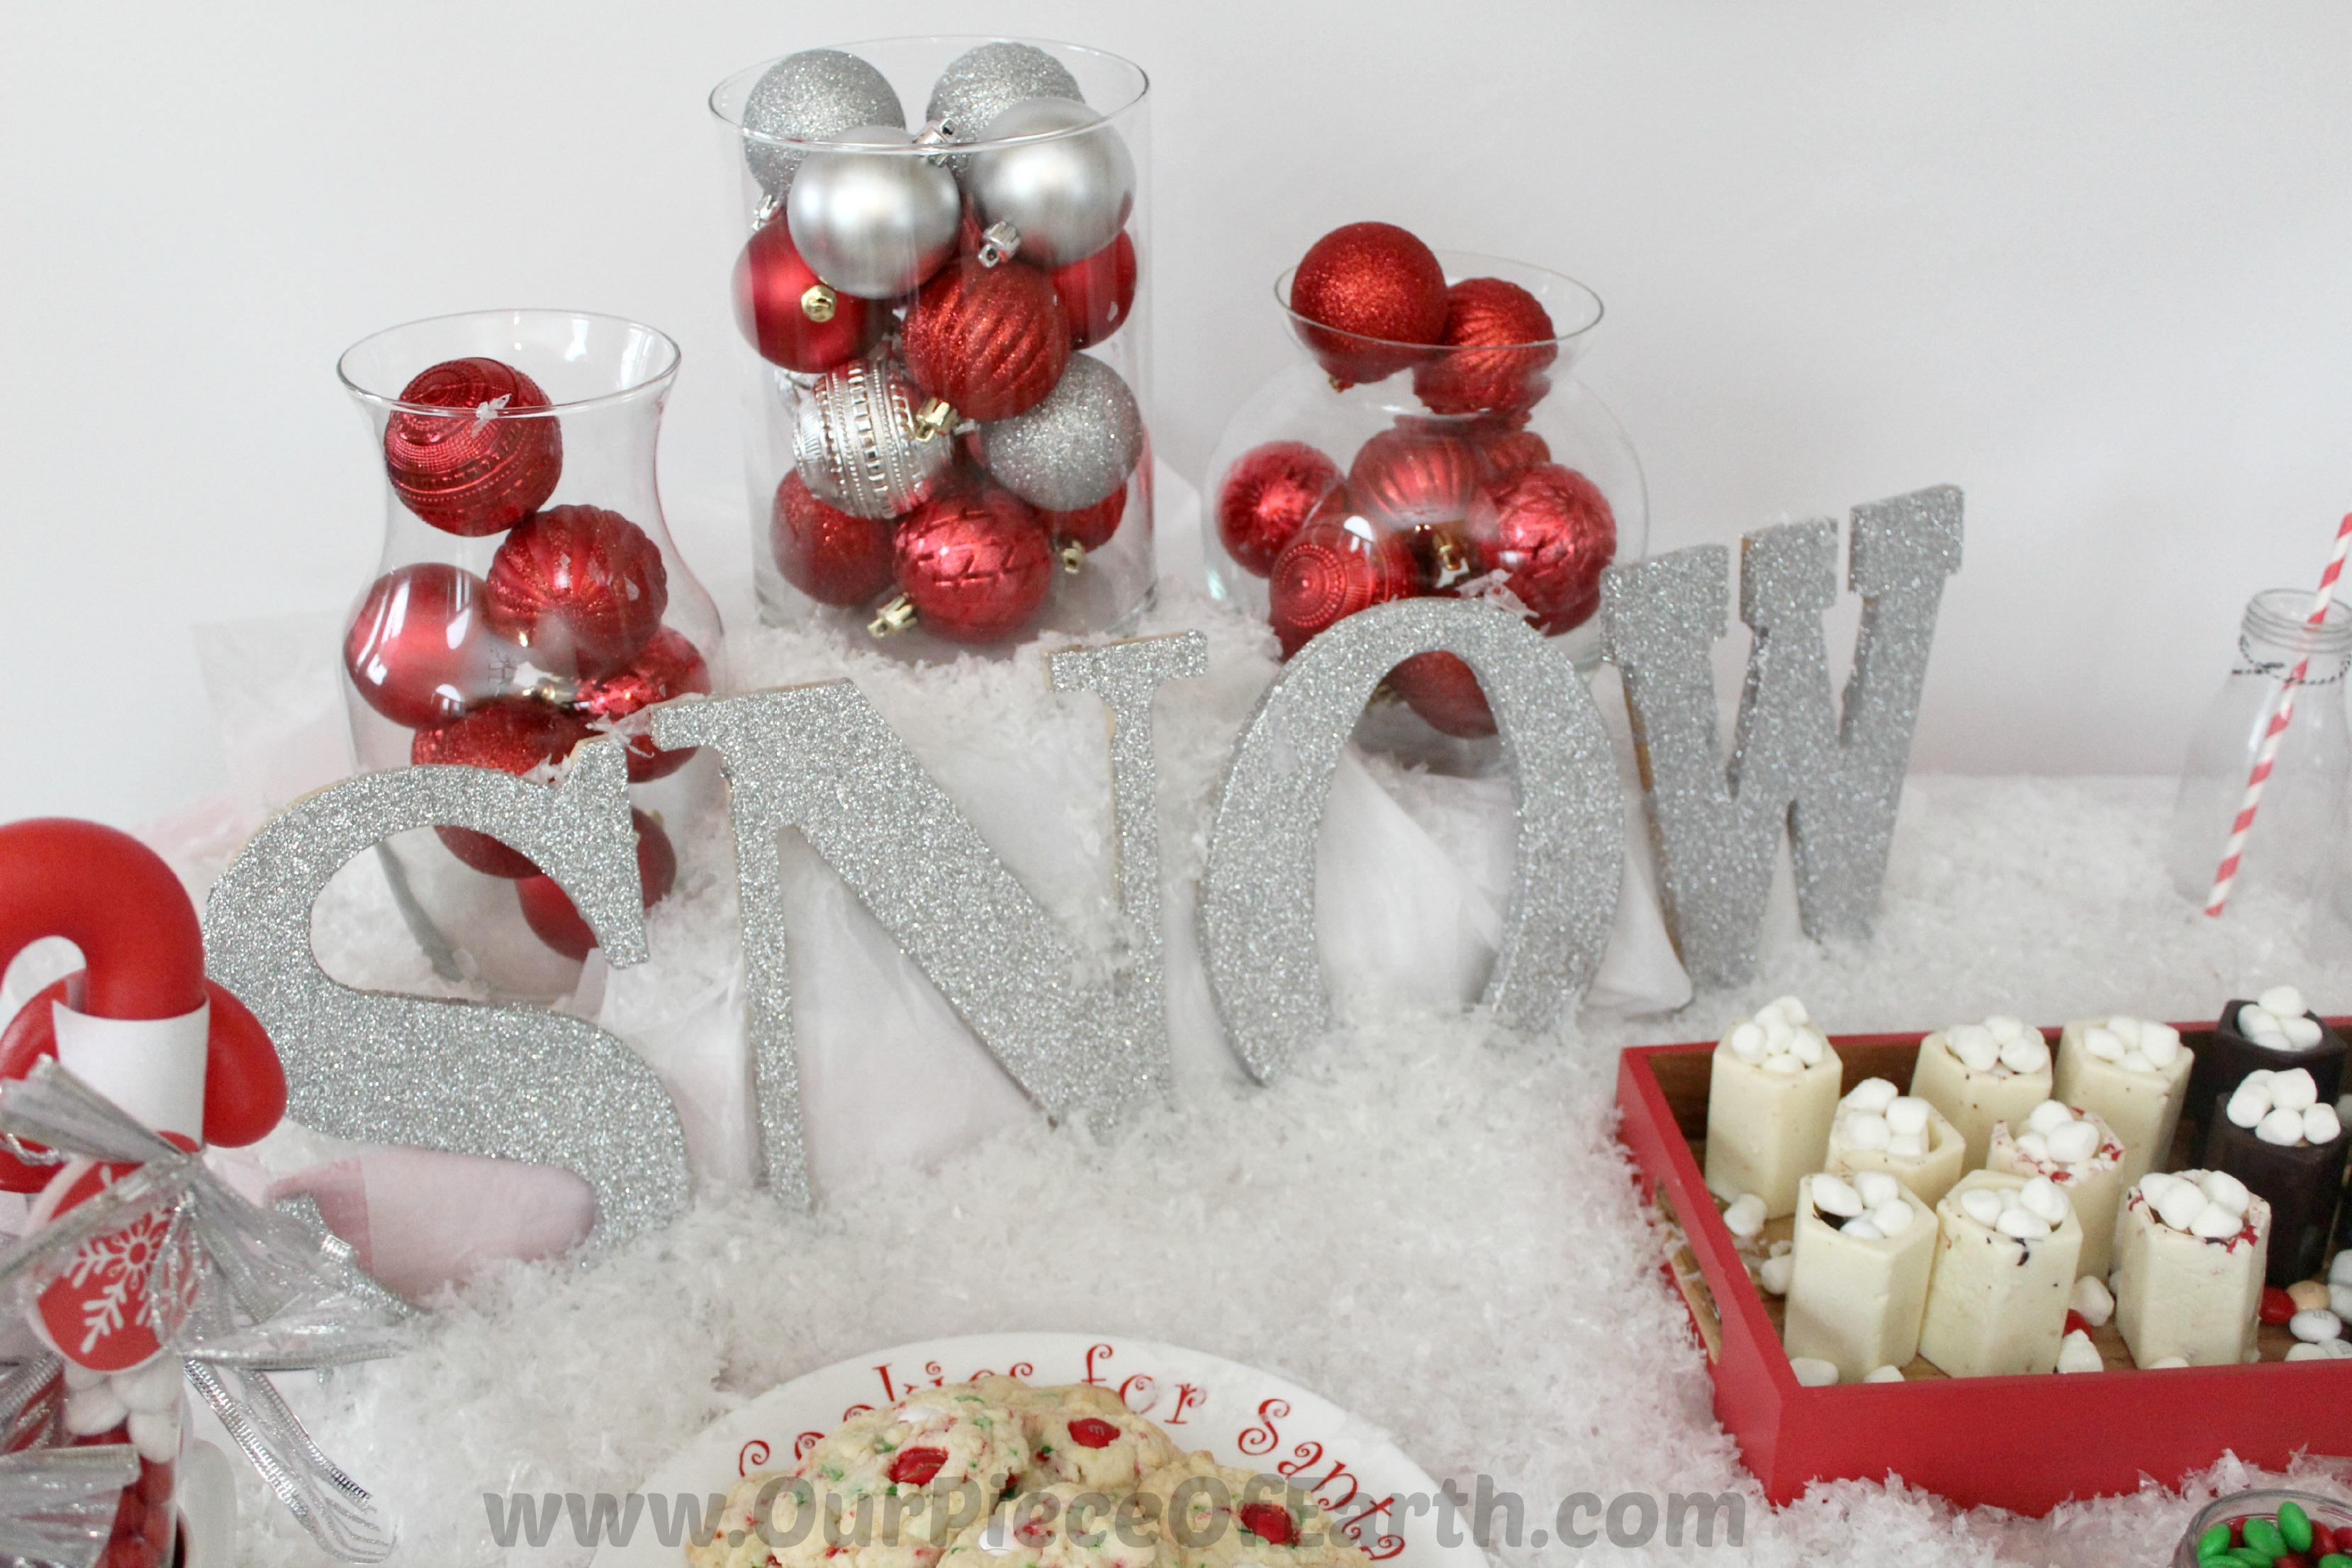 Glitter Snow winter decorations #BakeInTheFun Winter Tablescape